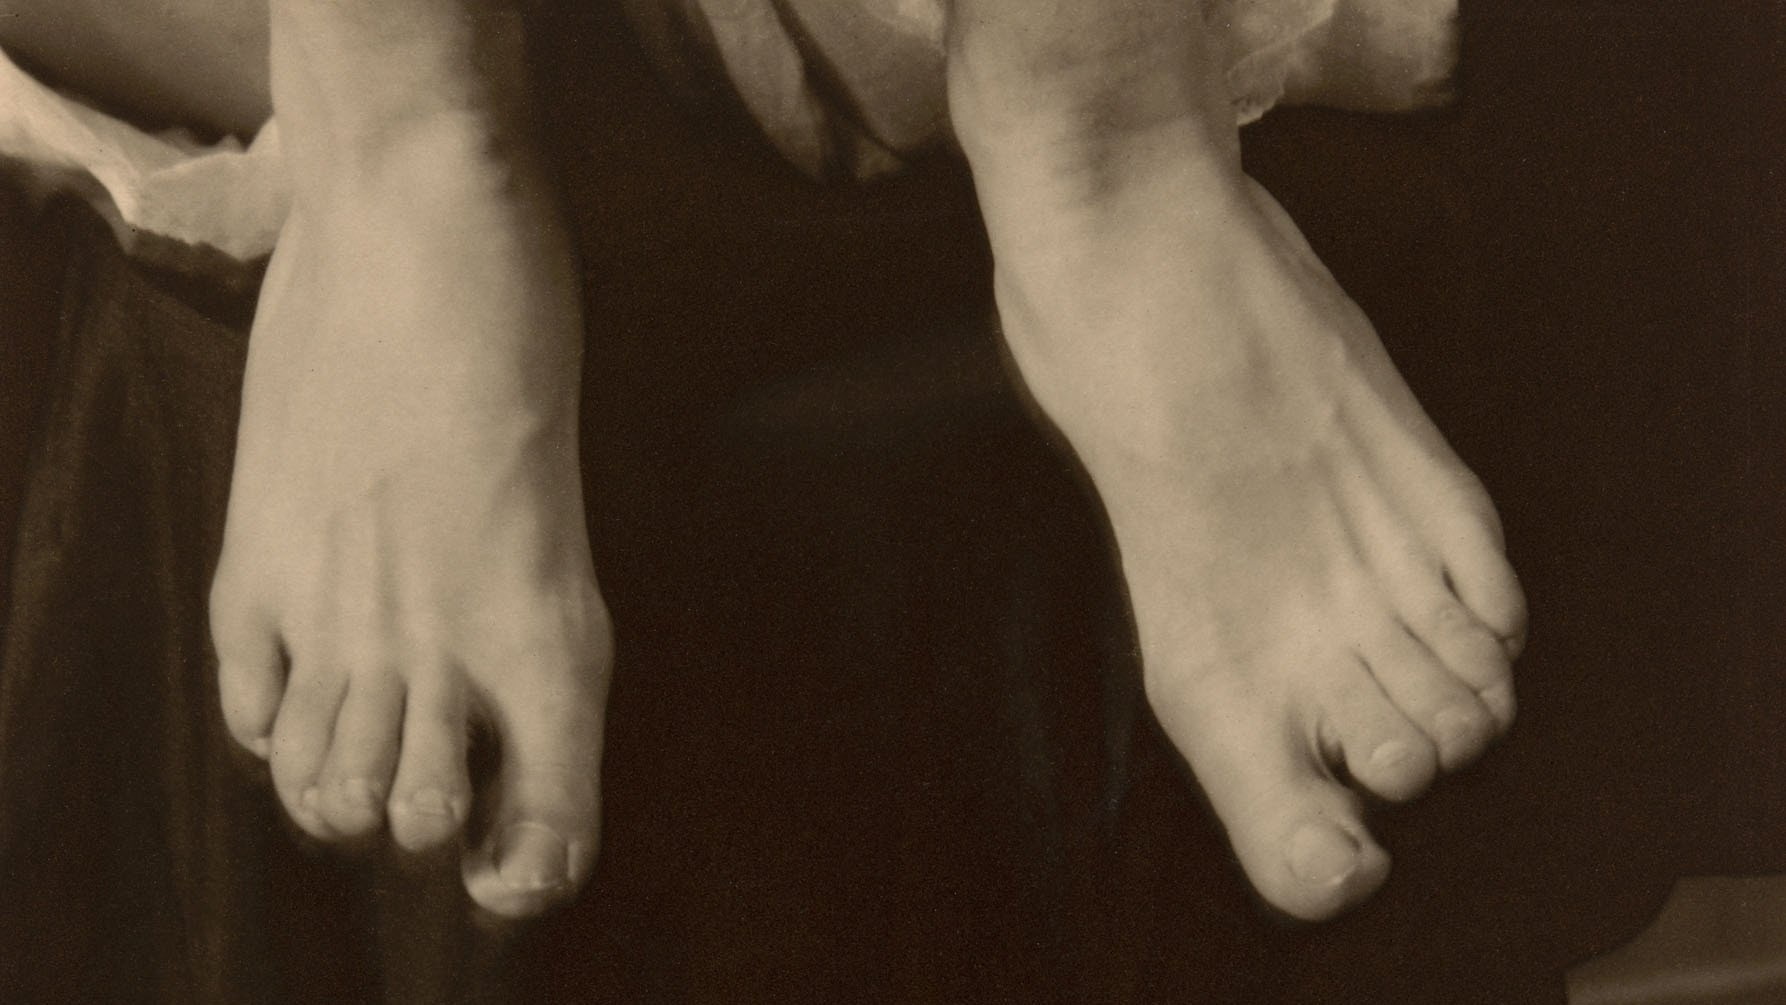 1949.746 Georgia Okeeffe Feet Alfred Stieglitz